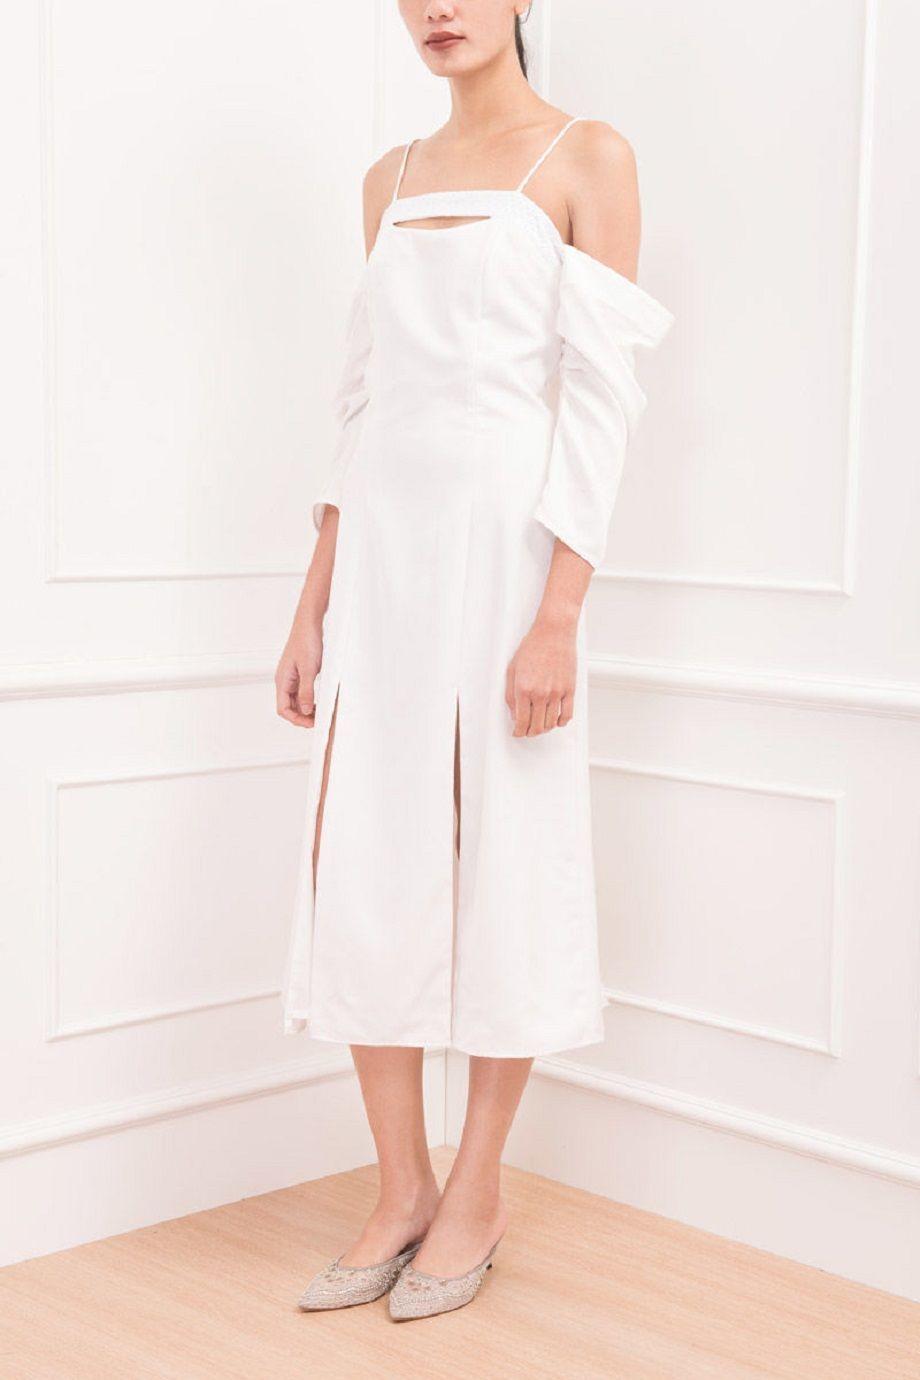 #PopbelaOOTD: Dress Manis untuk Dipakai ke Acara Pernikahan